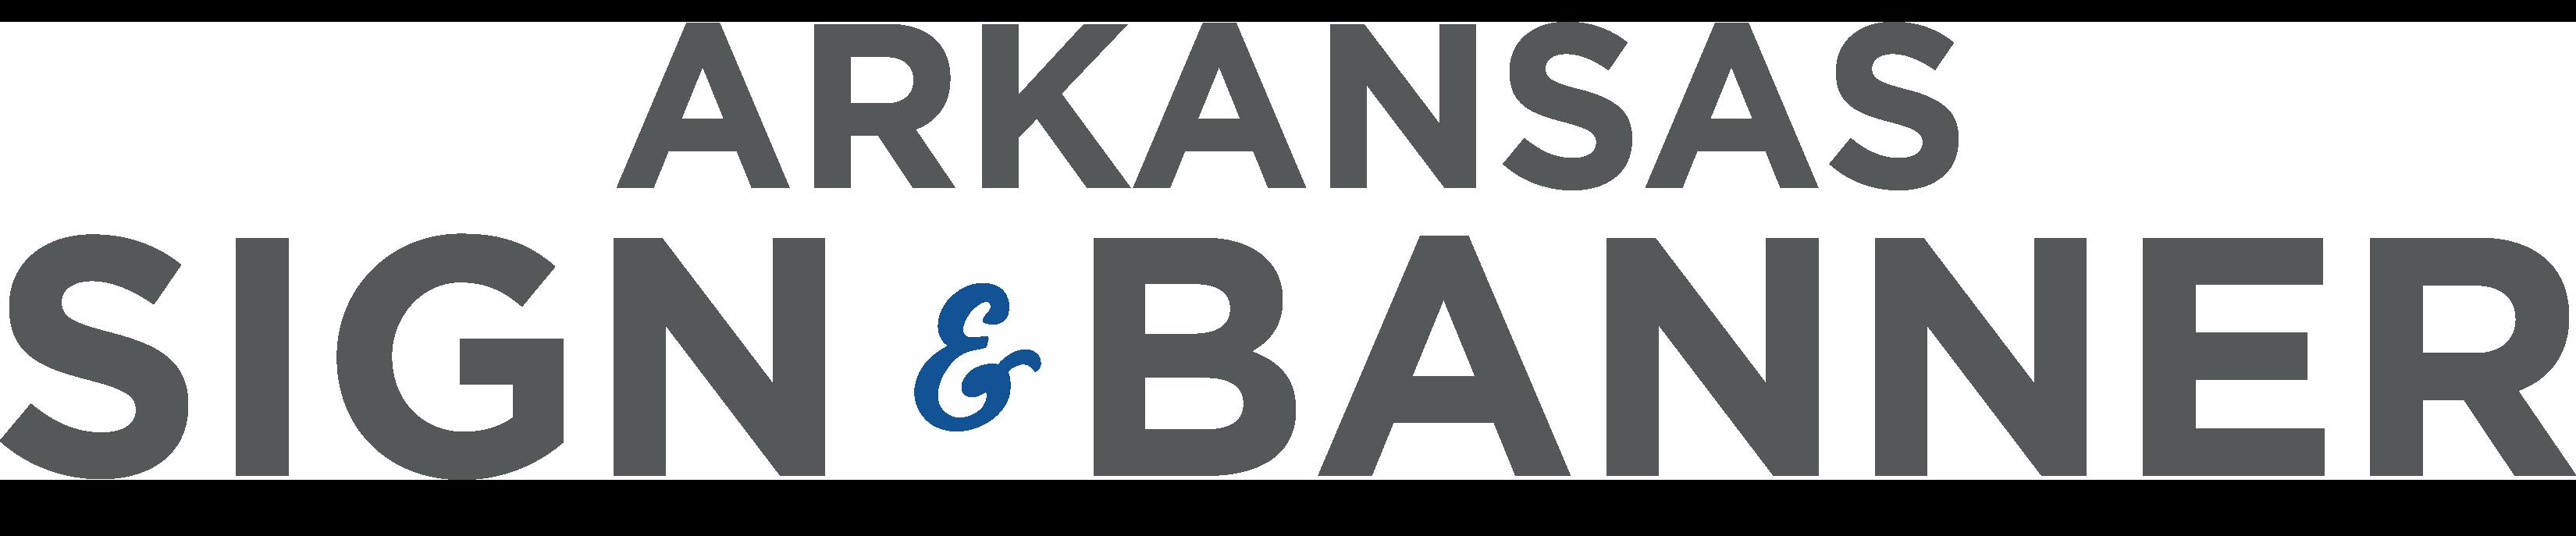 Arkansas Sign & Banner